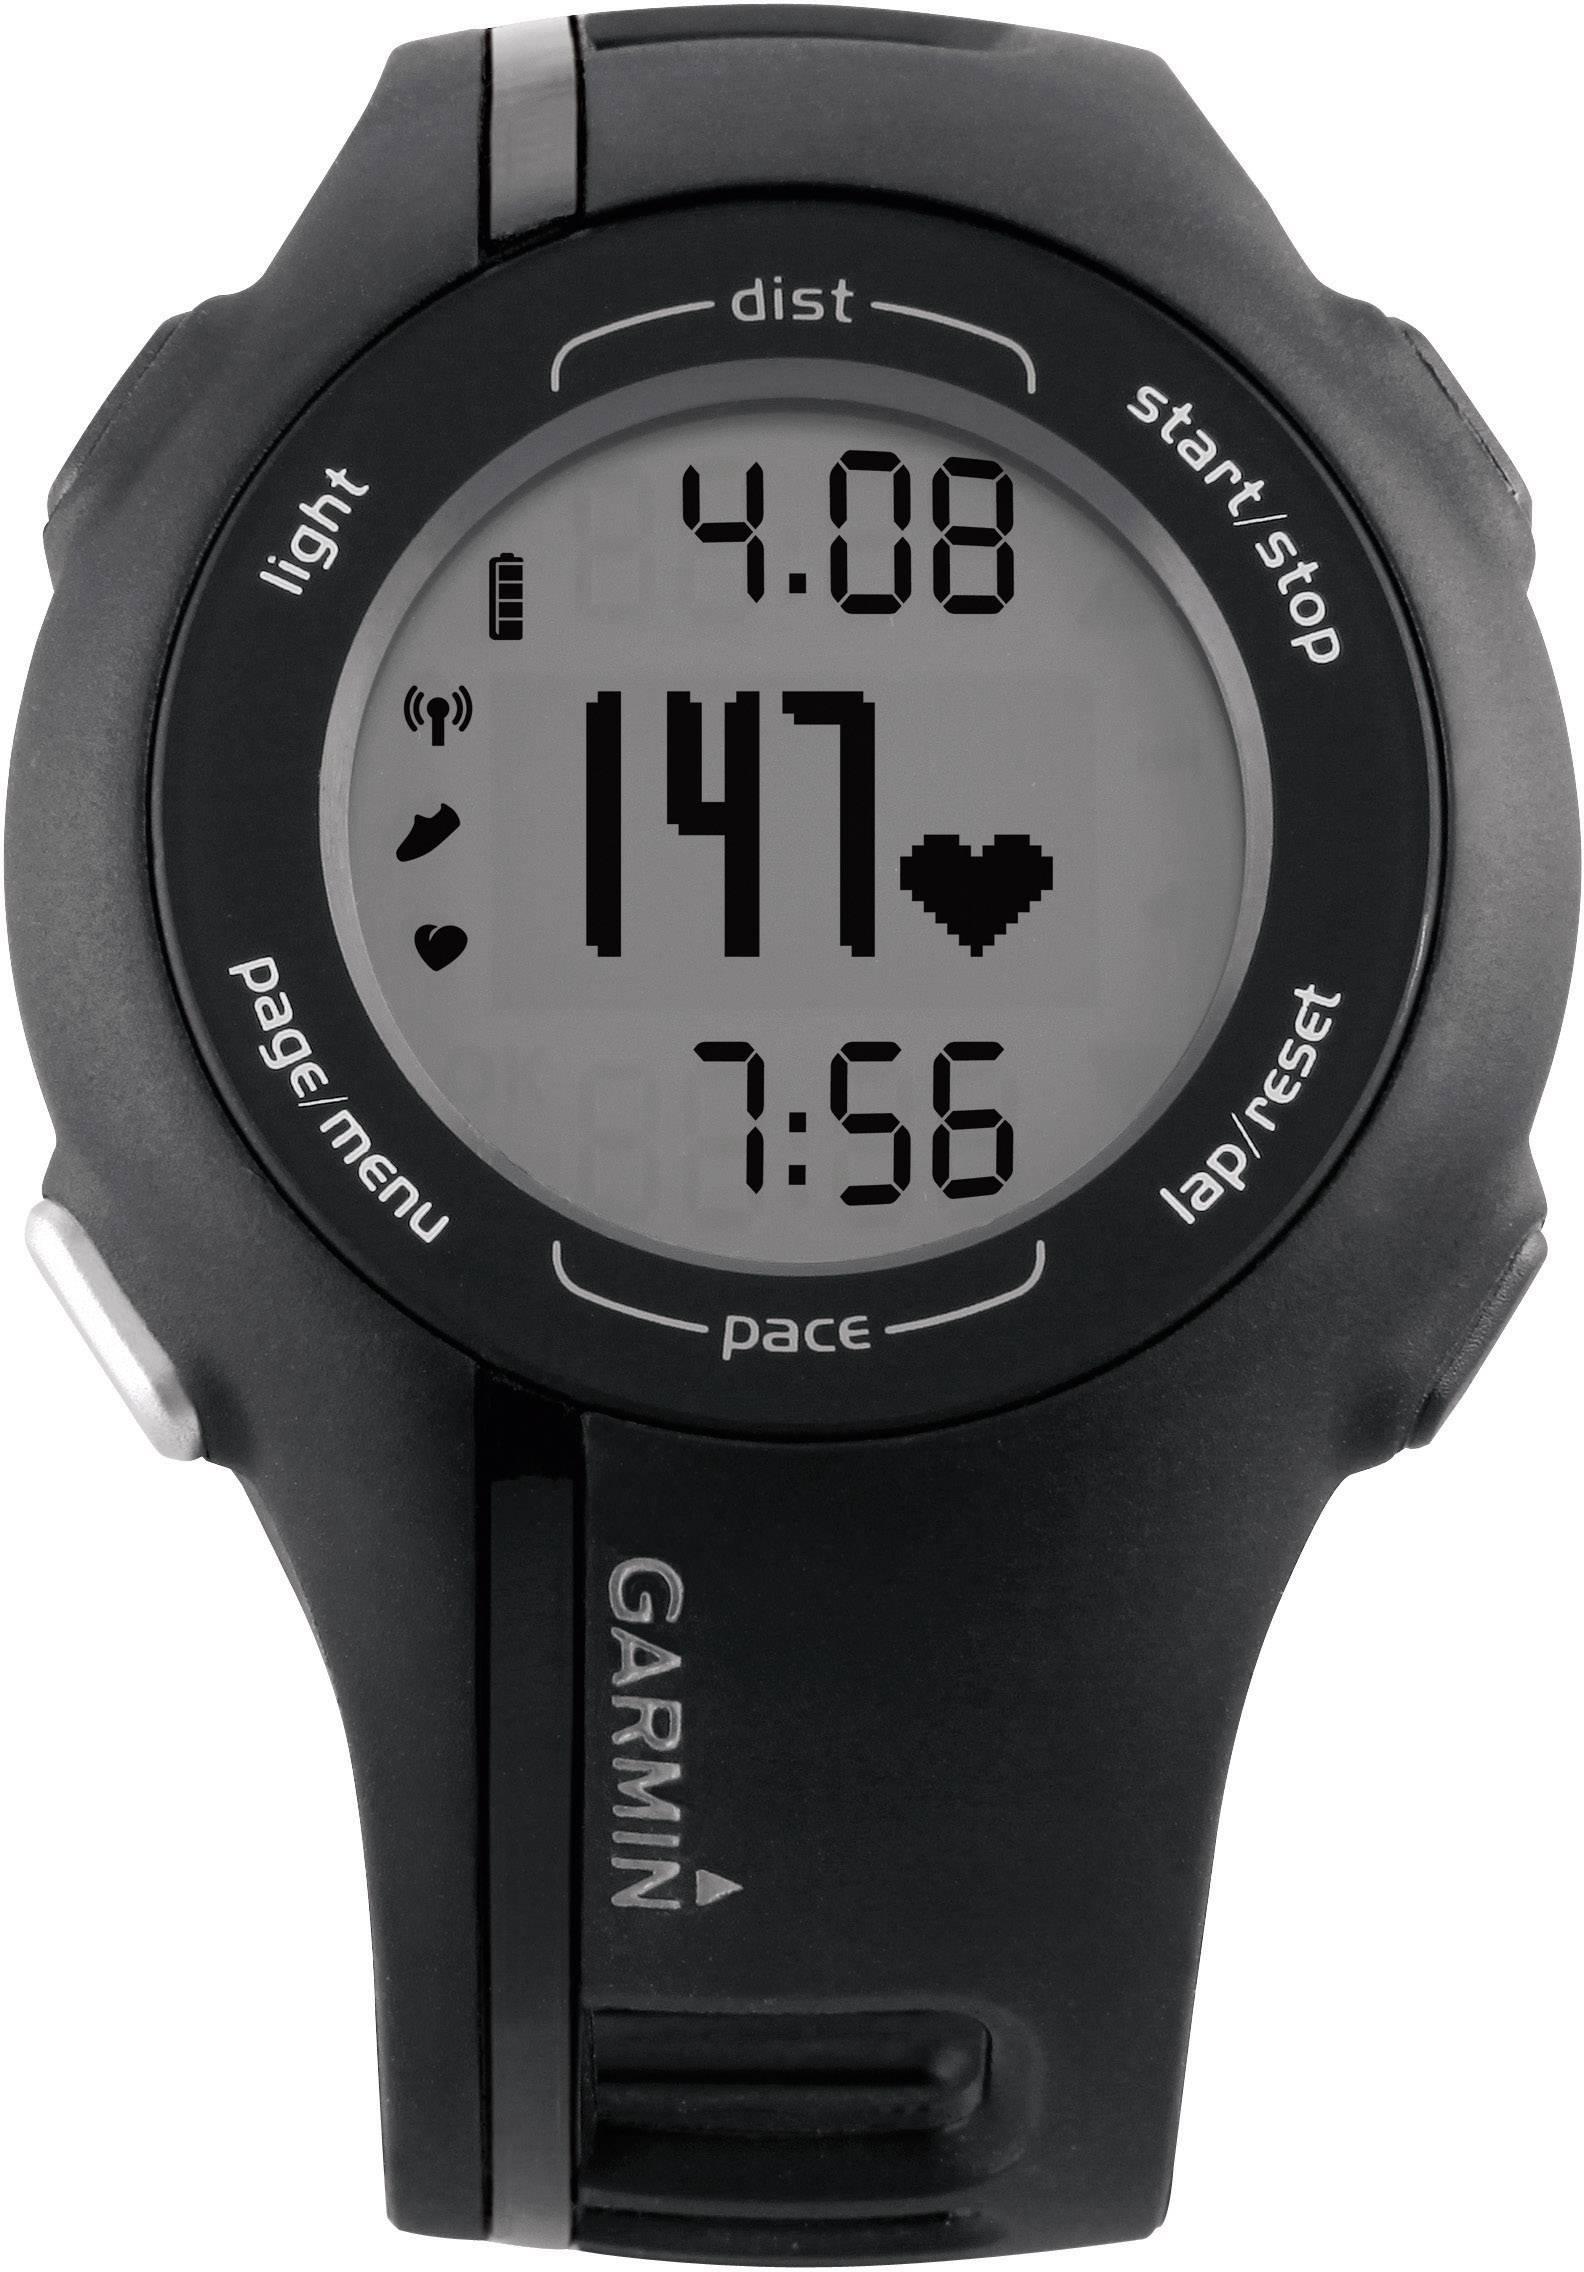 Sportelektronik Fitness & Jogging Garmin Forerunner 210  Premium GPS-Fähige Sportuhr